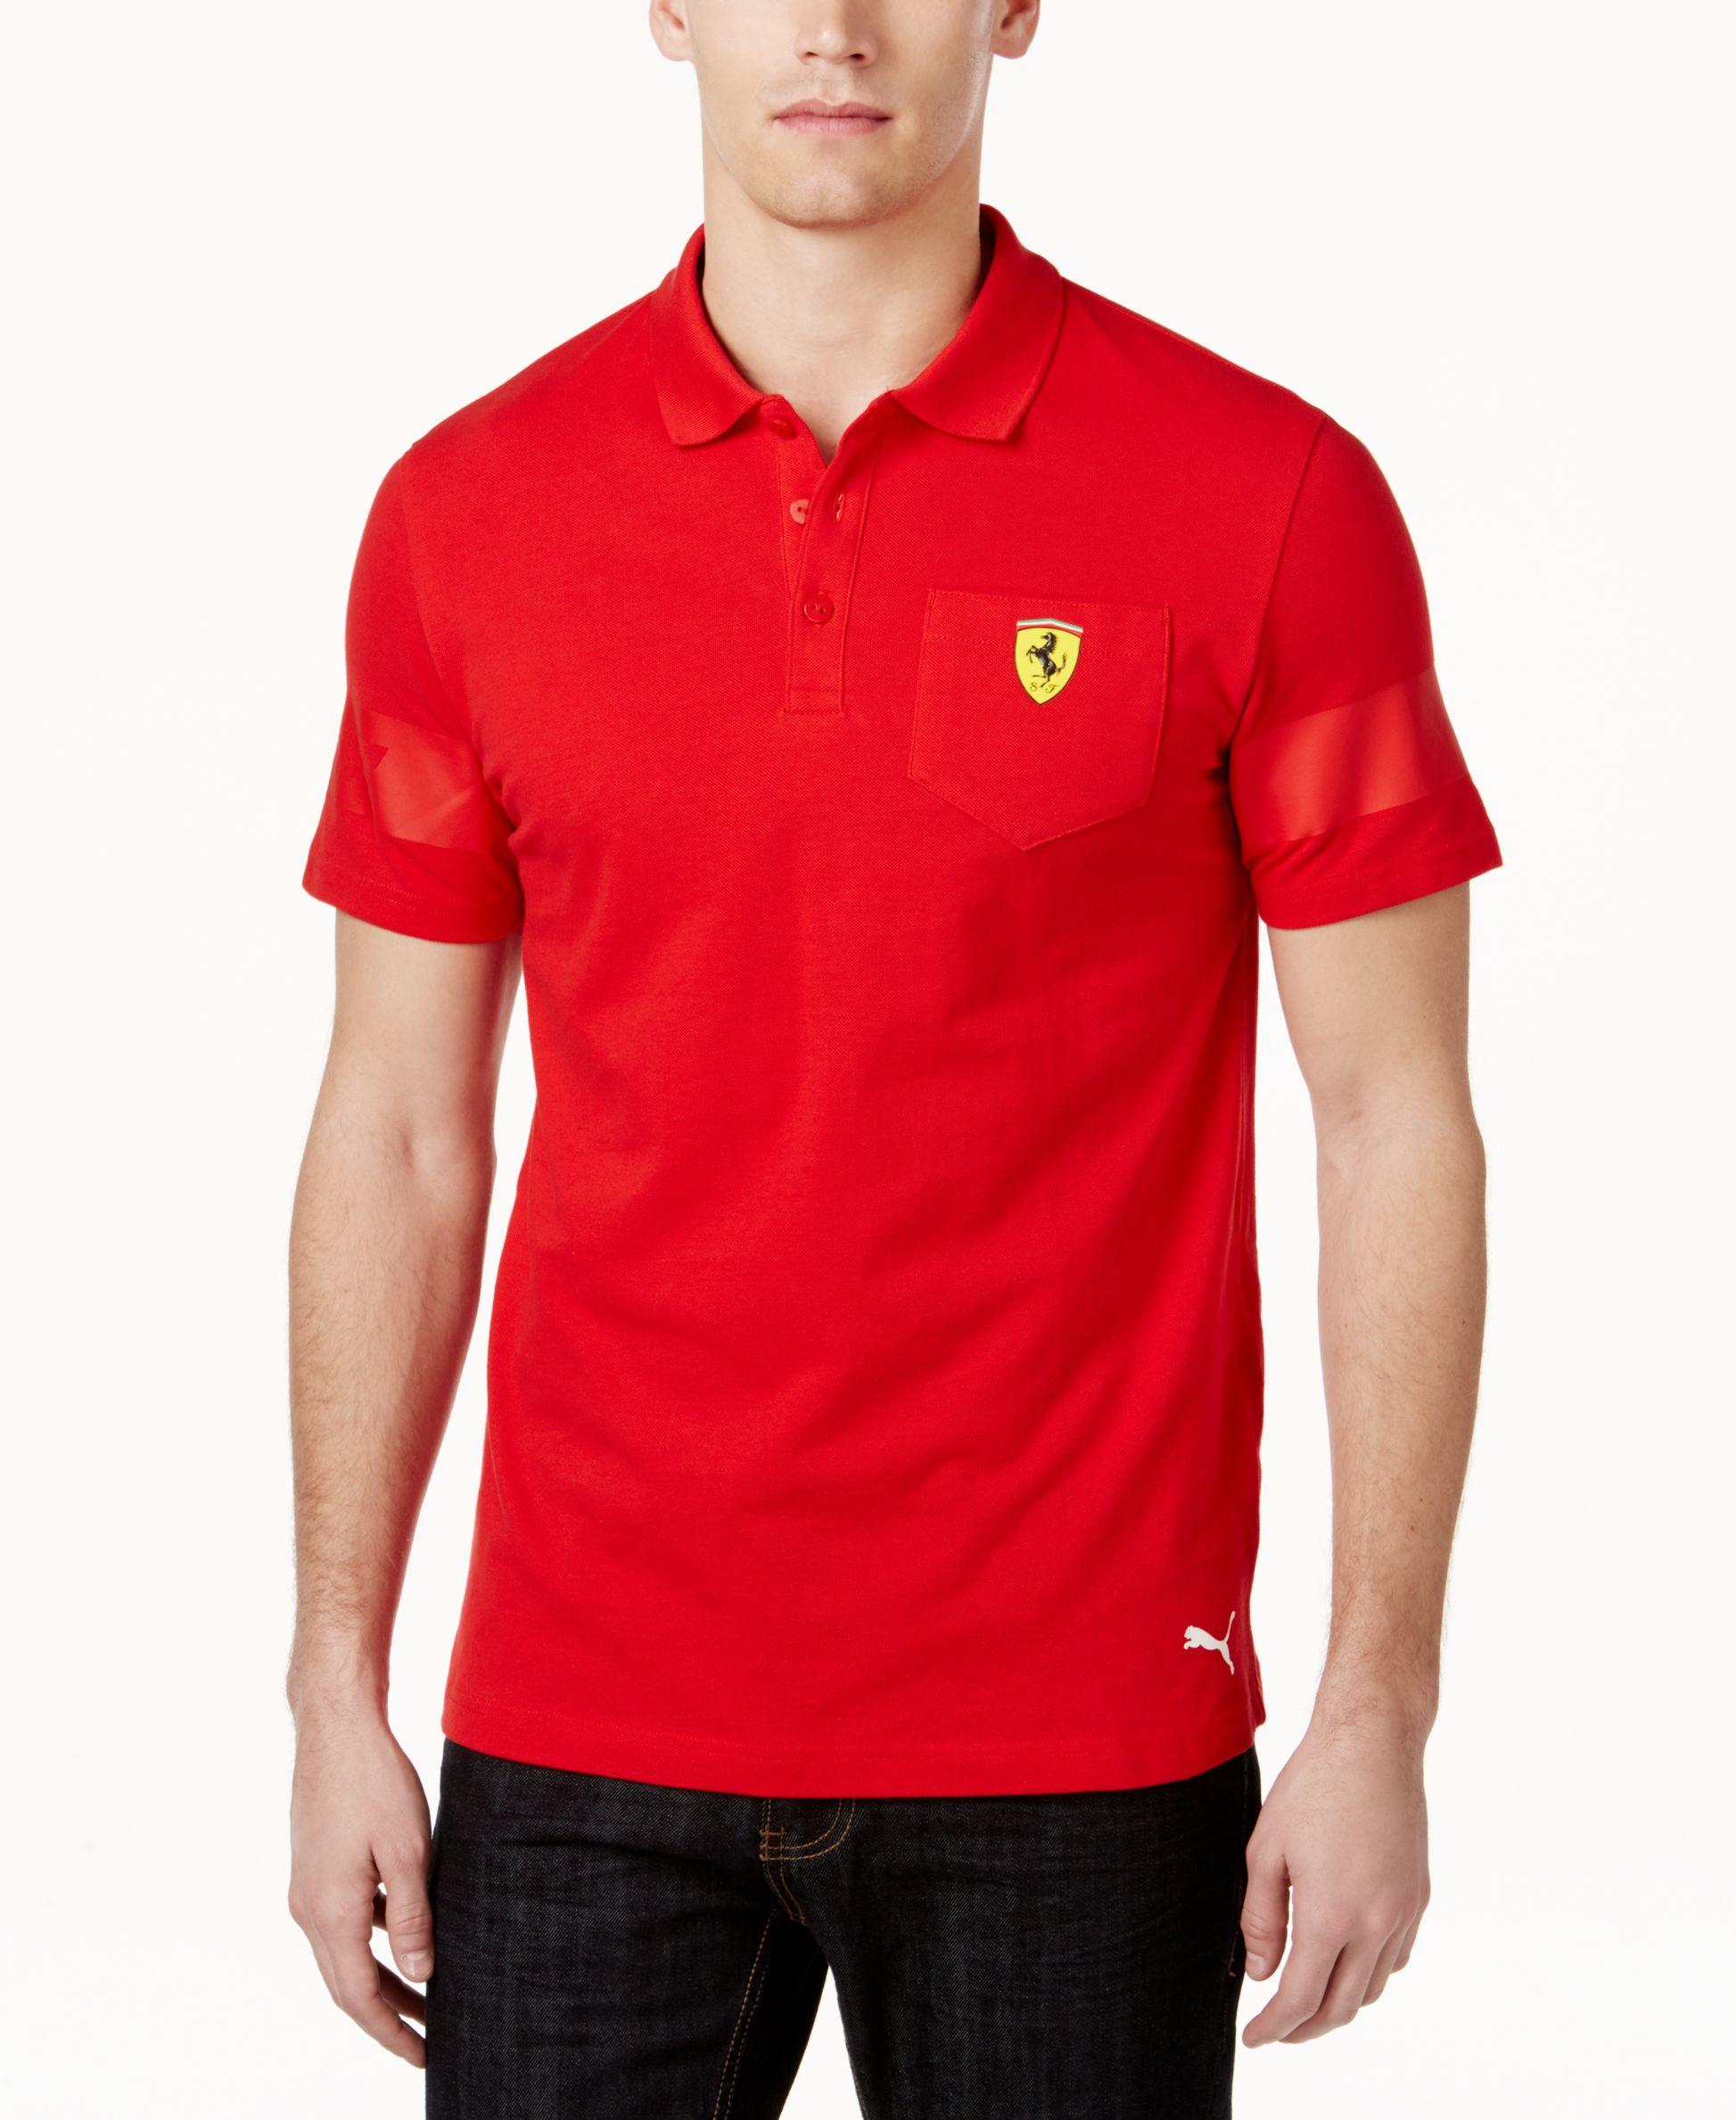 stripe ferrari products front shirt turo